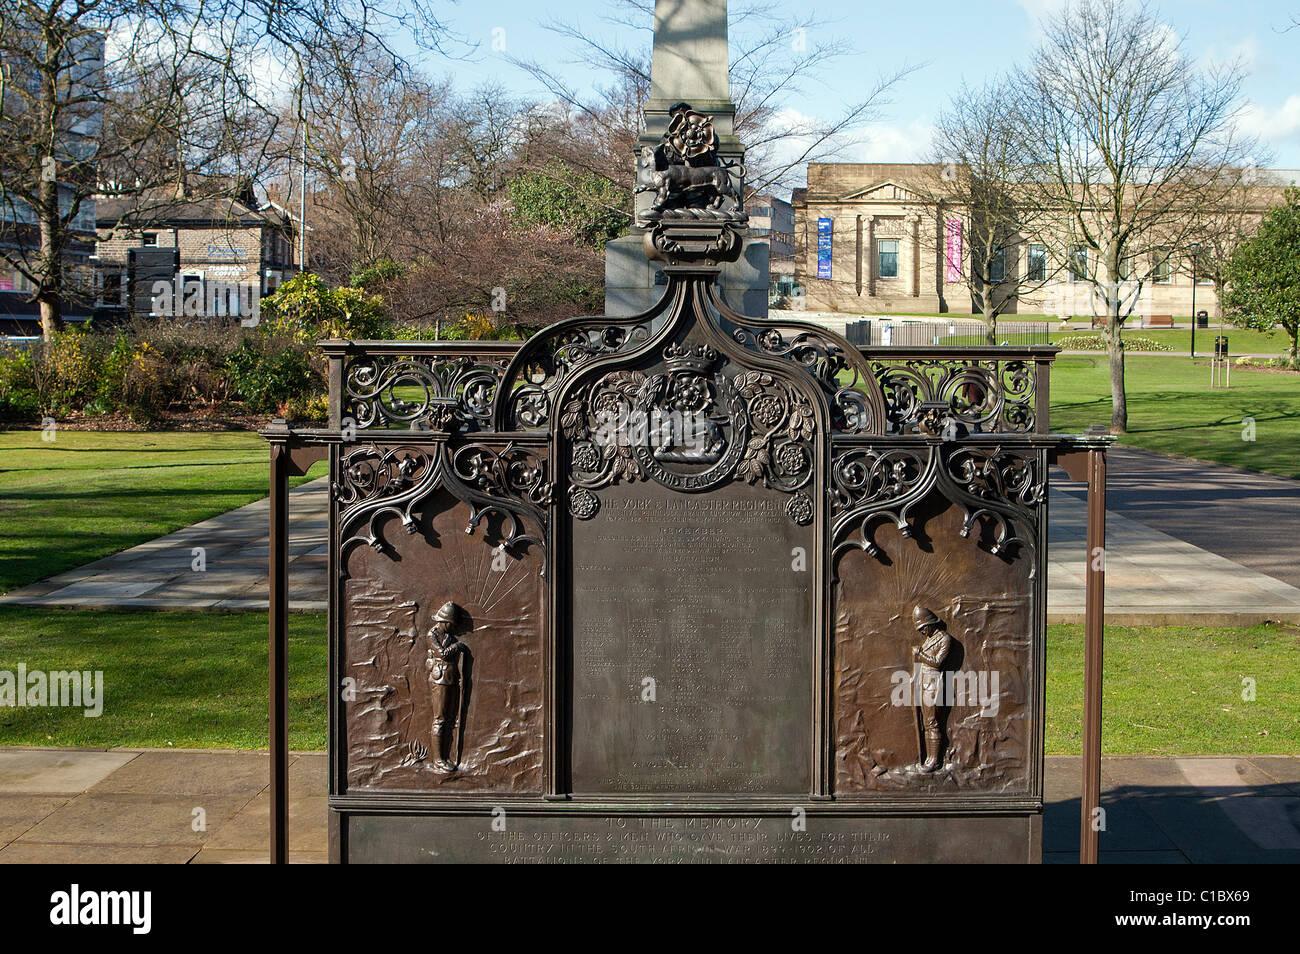 Boer War Memorial, Weston Park Sheffield - Stock Image